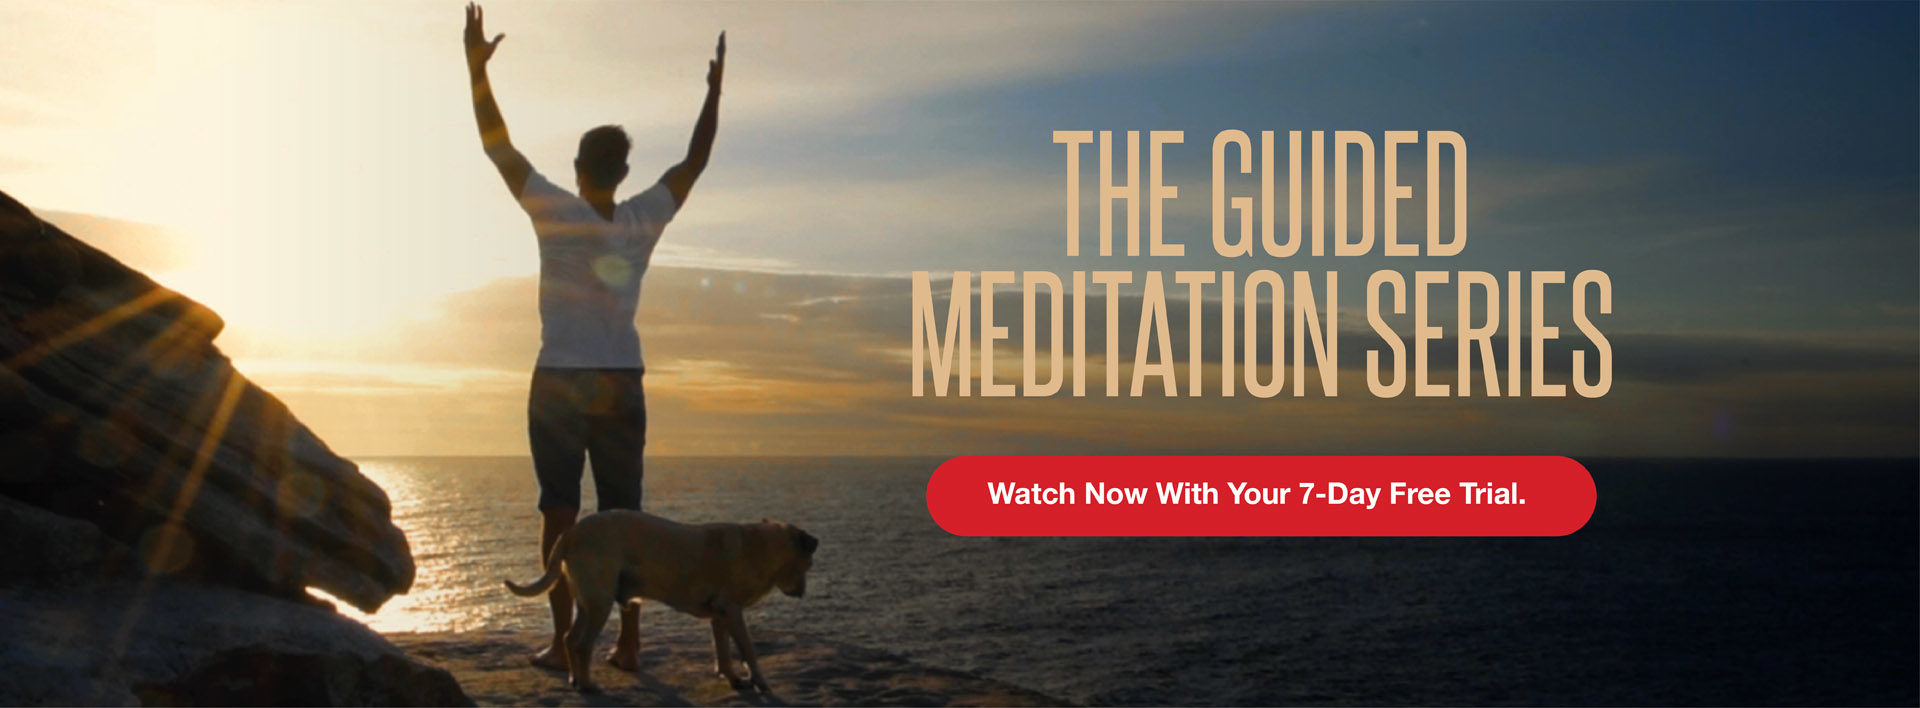 8-guided-meditation